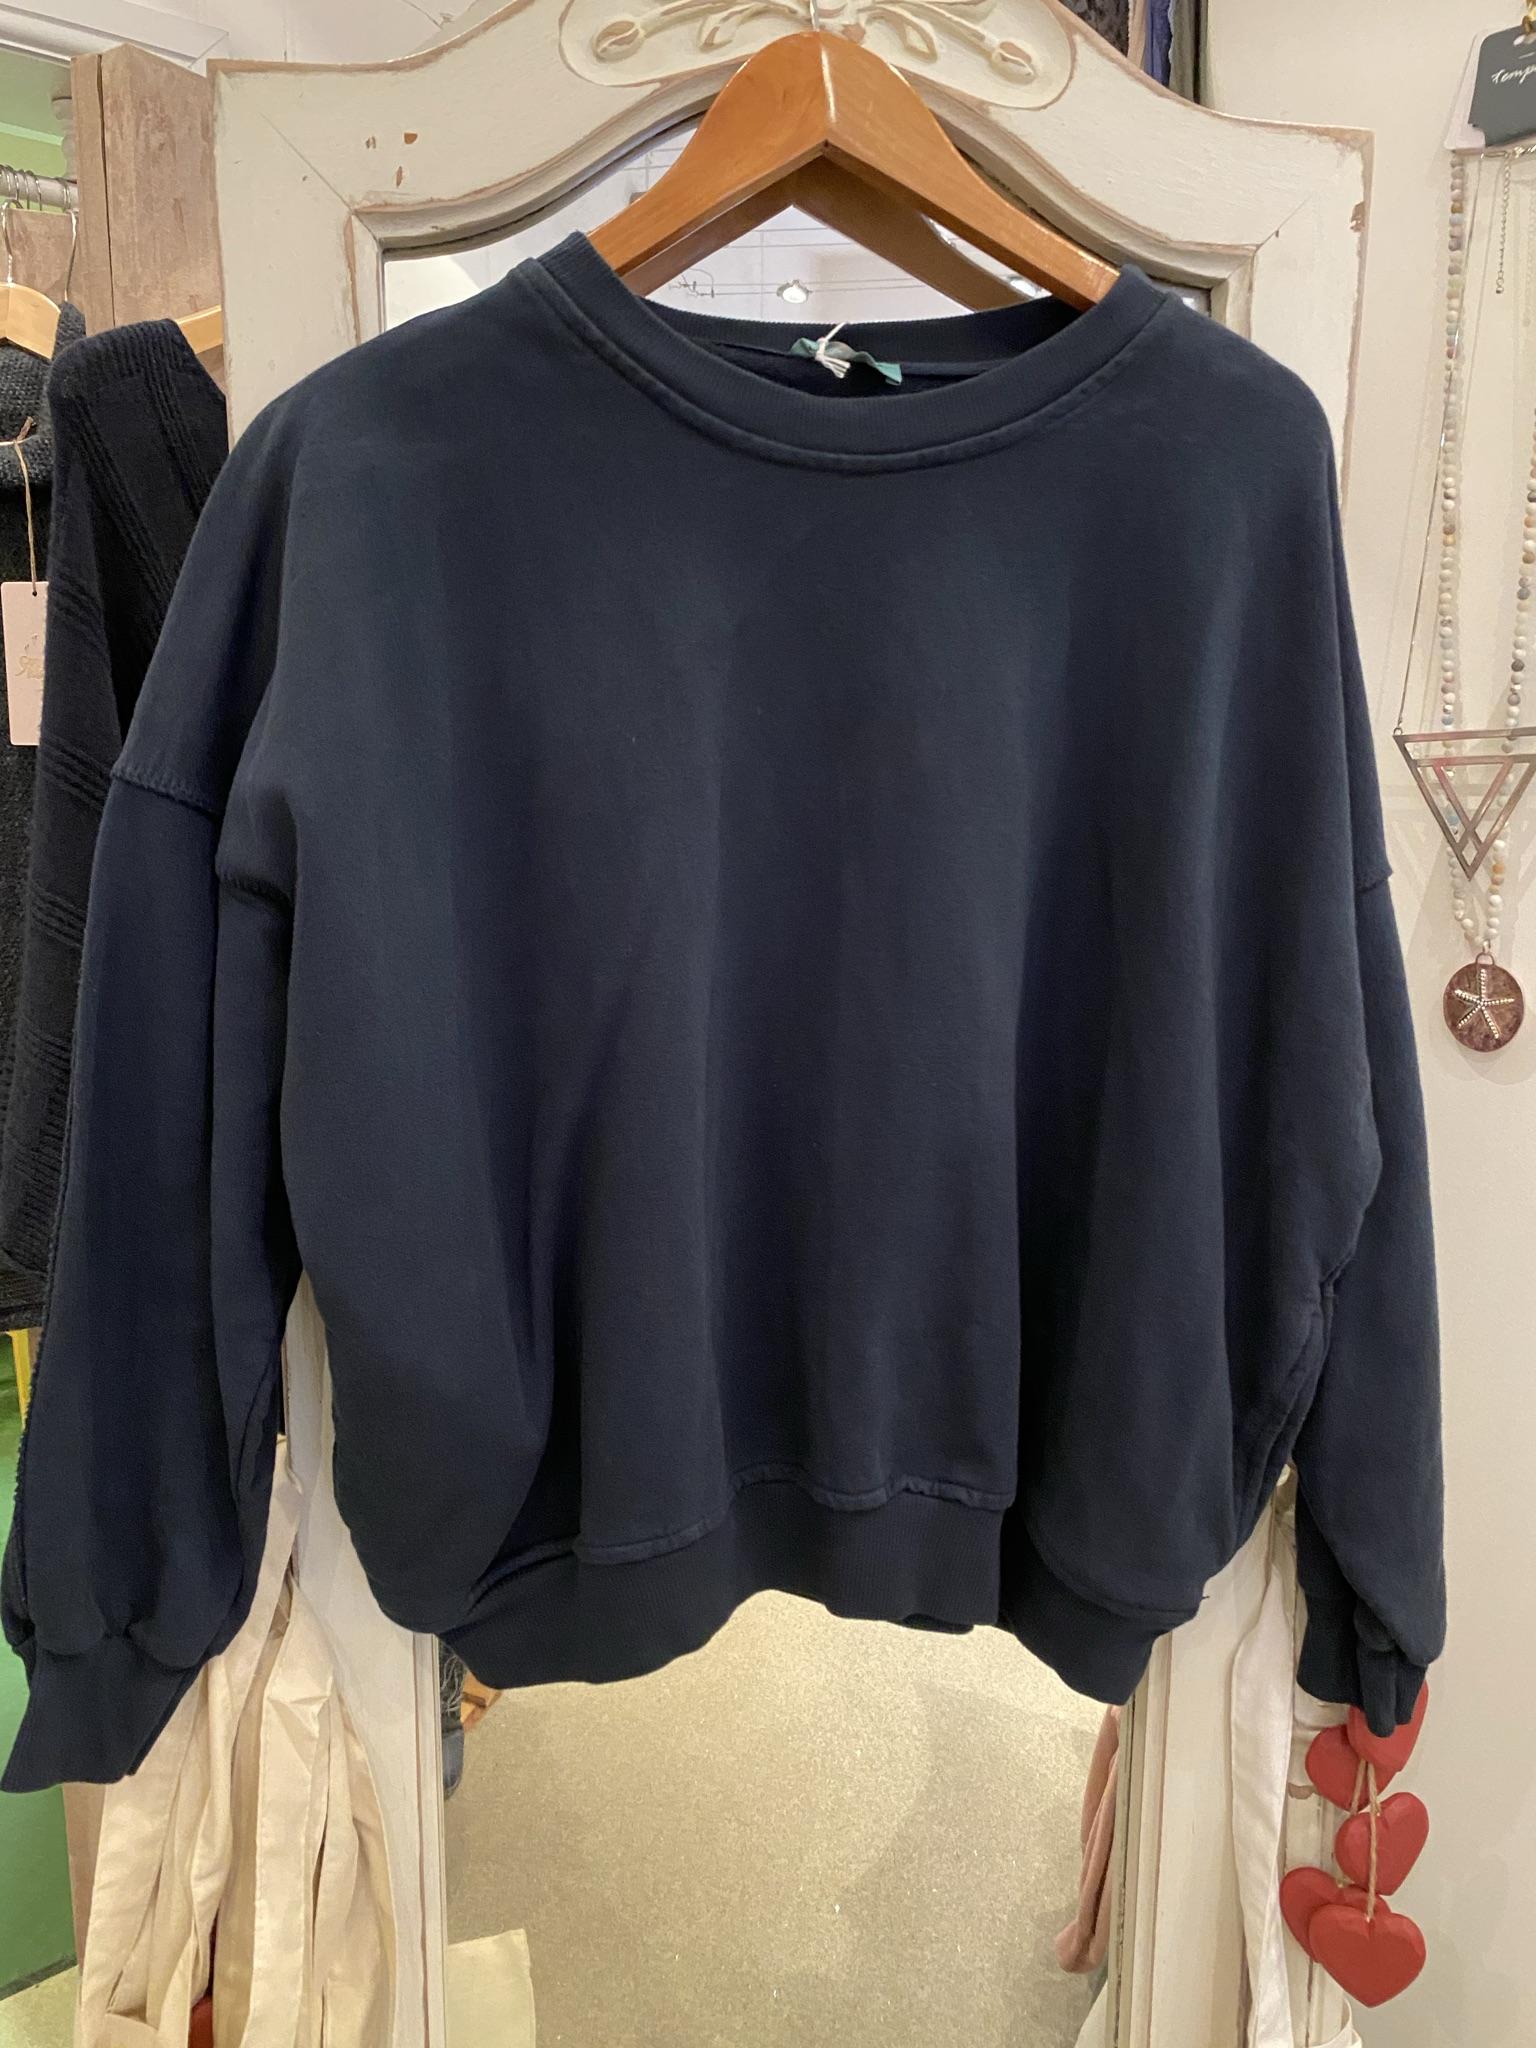 Crew neck sweatshirt with pockets